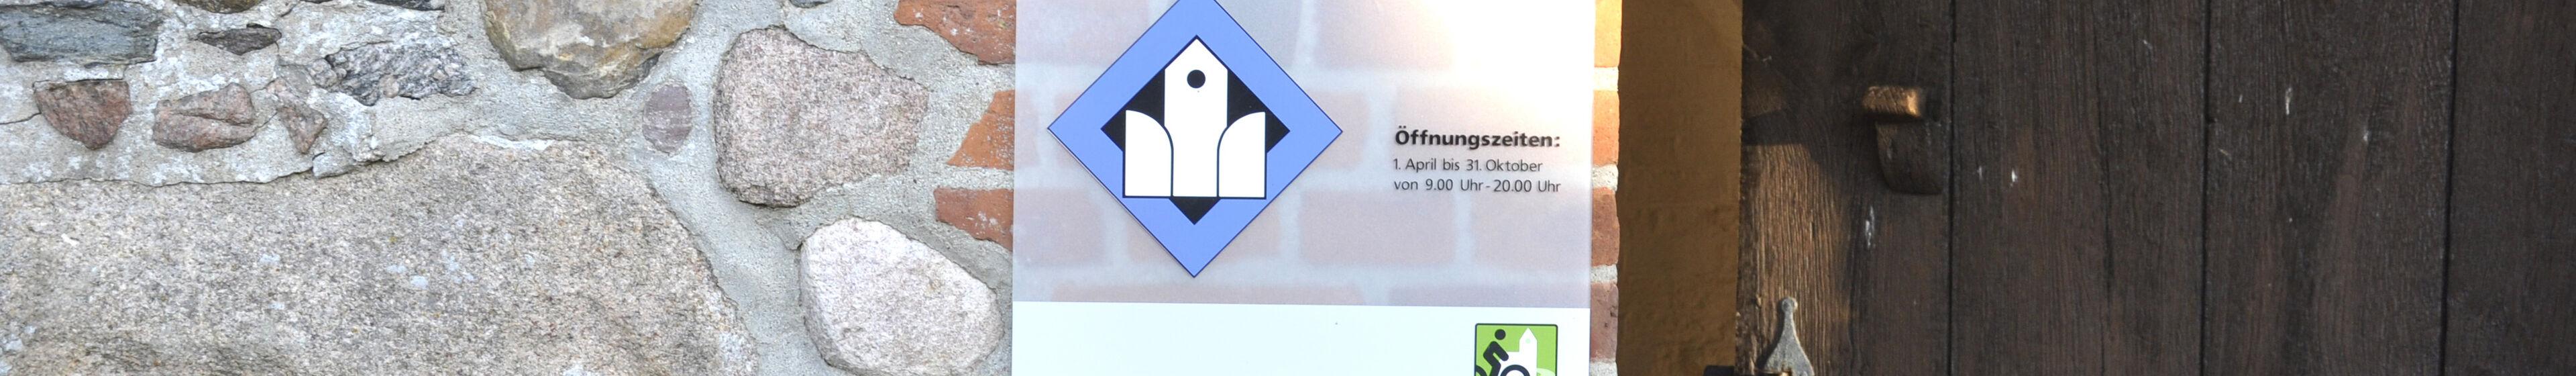 Radwege-Signet kirche kopfbild cordes